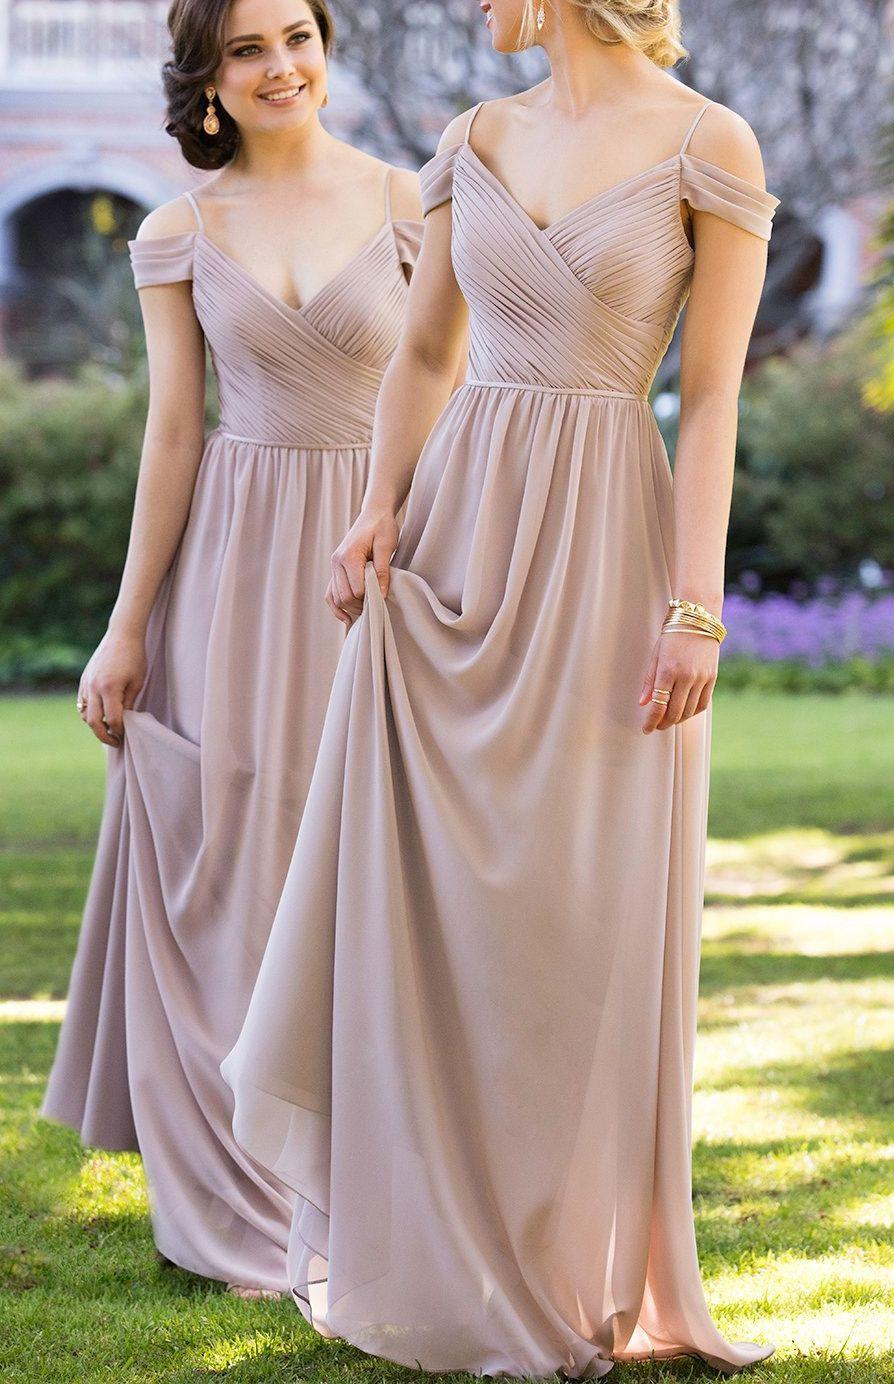 Sleeveless dresses long grey bridesmaid dresses with ruffles zipper